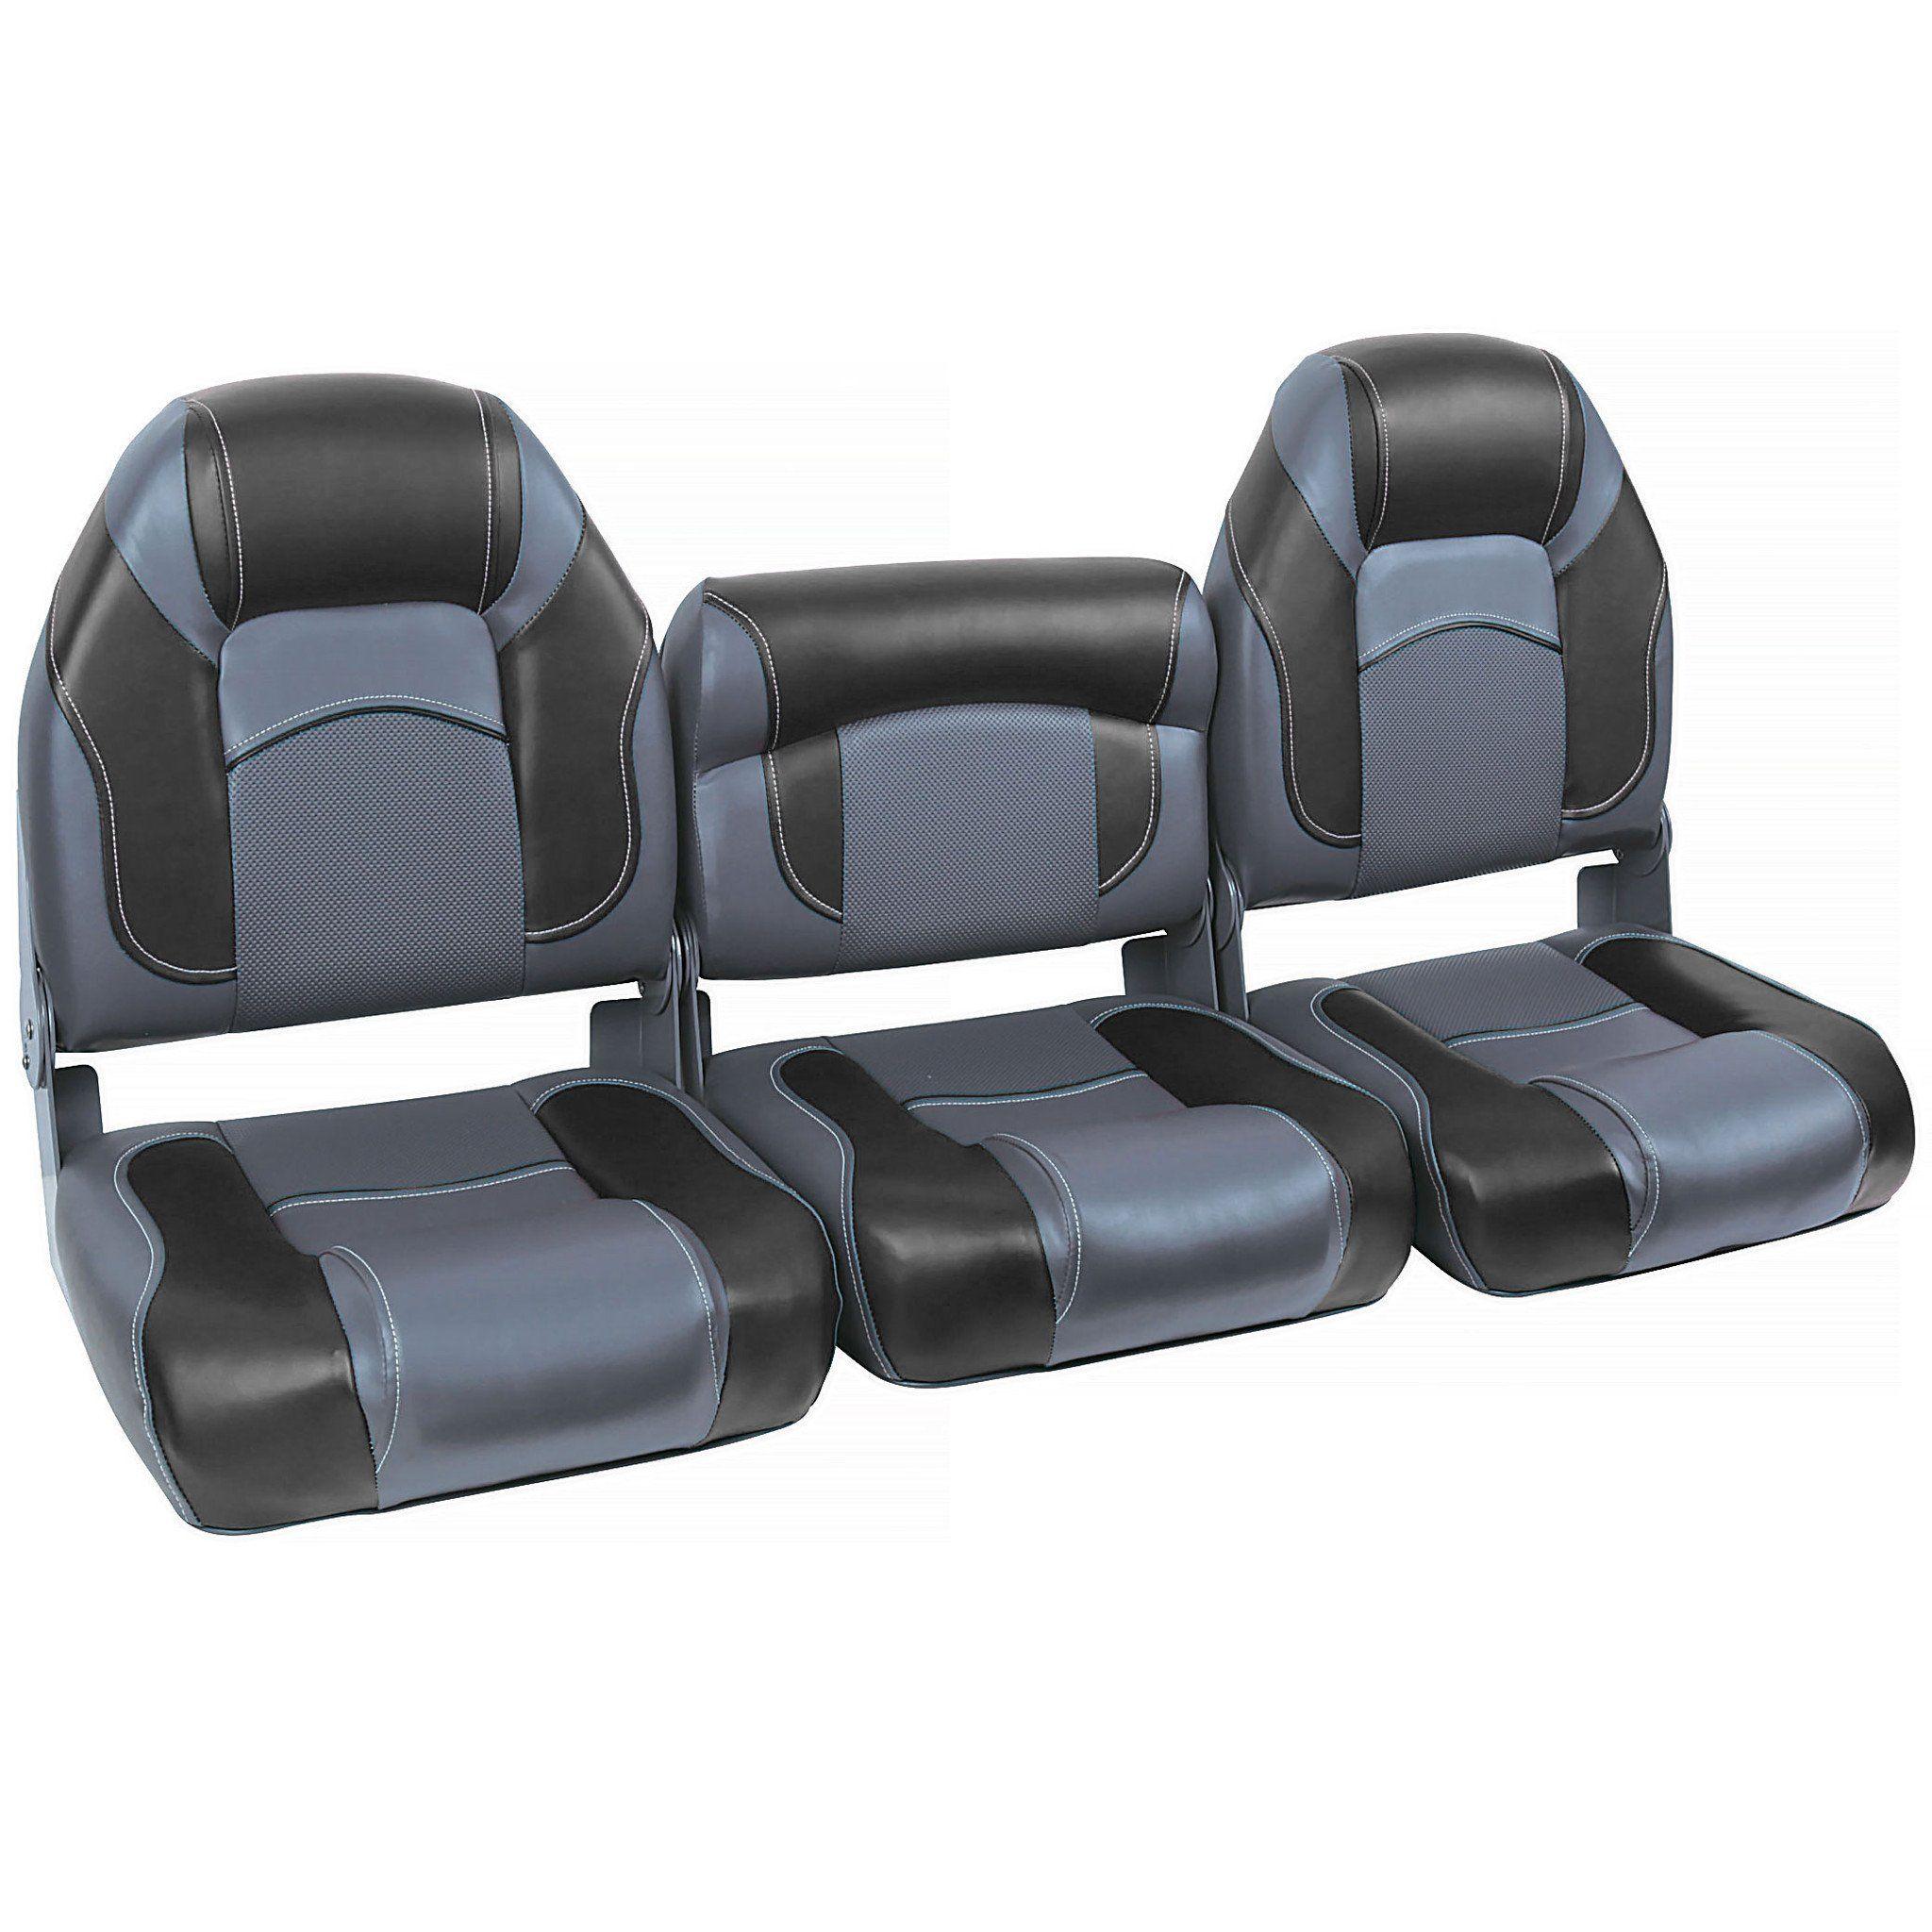 "51"" Fold Down Bench Seats Bench seat, Boat seats, Bench"